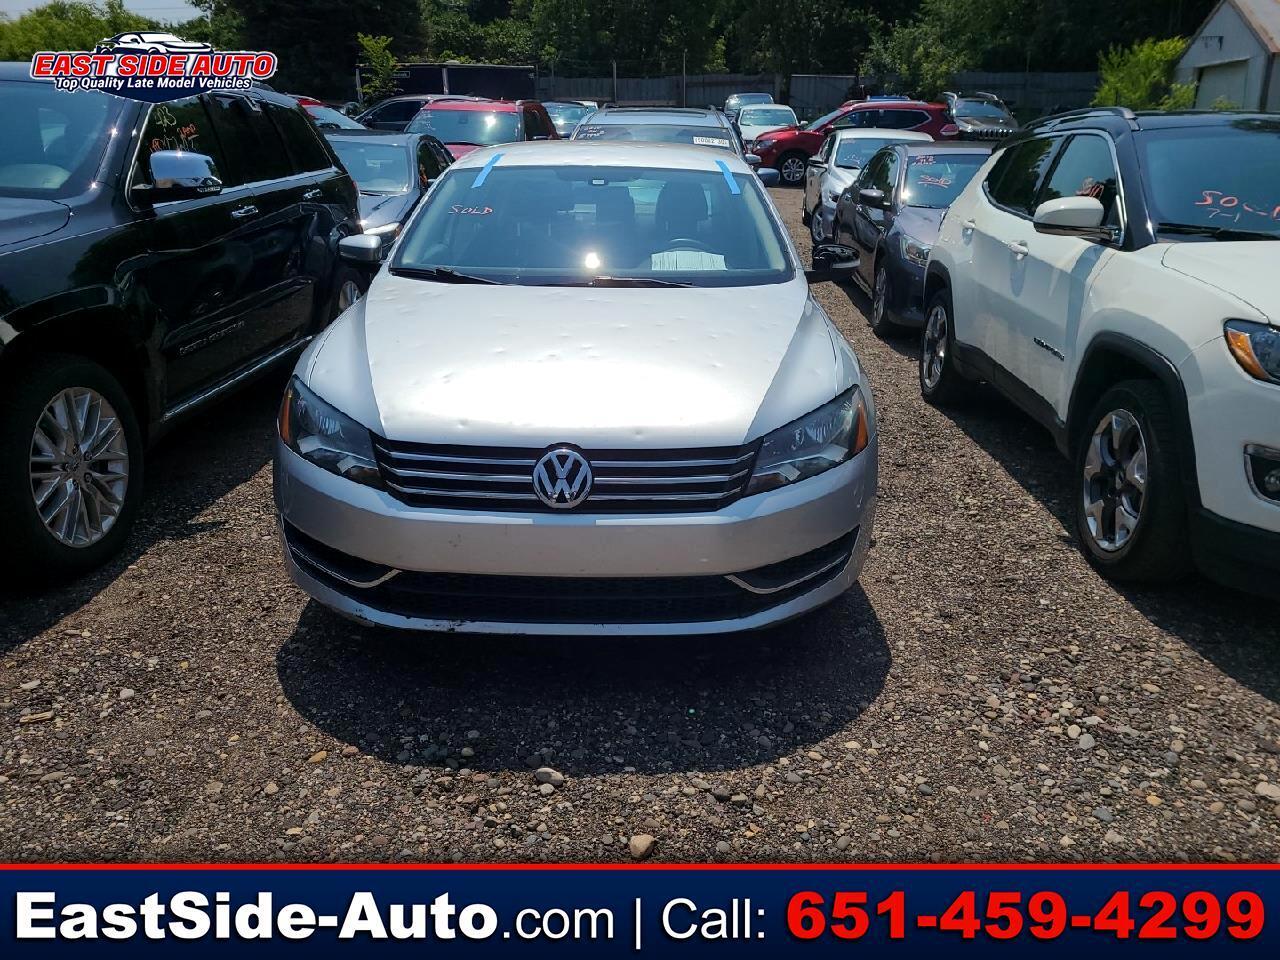 Volkswagen Passat 4dr Sdn 2.5L Auto S *Ltd Avail* 2014